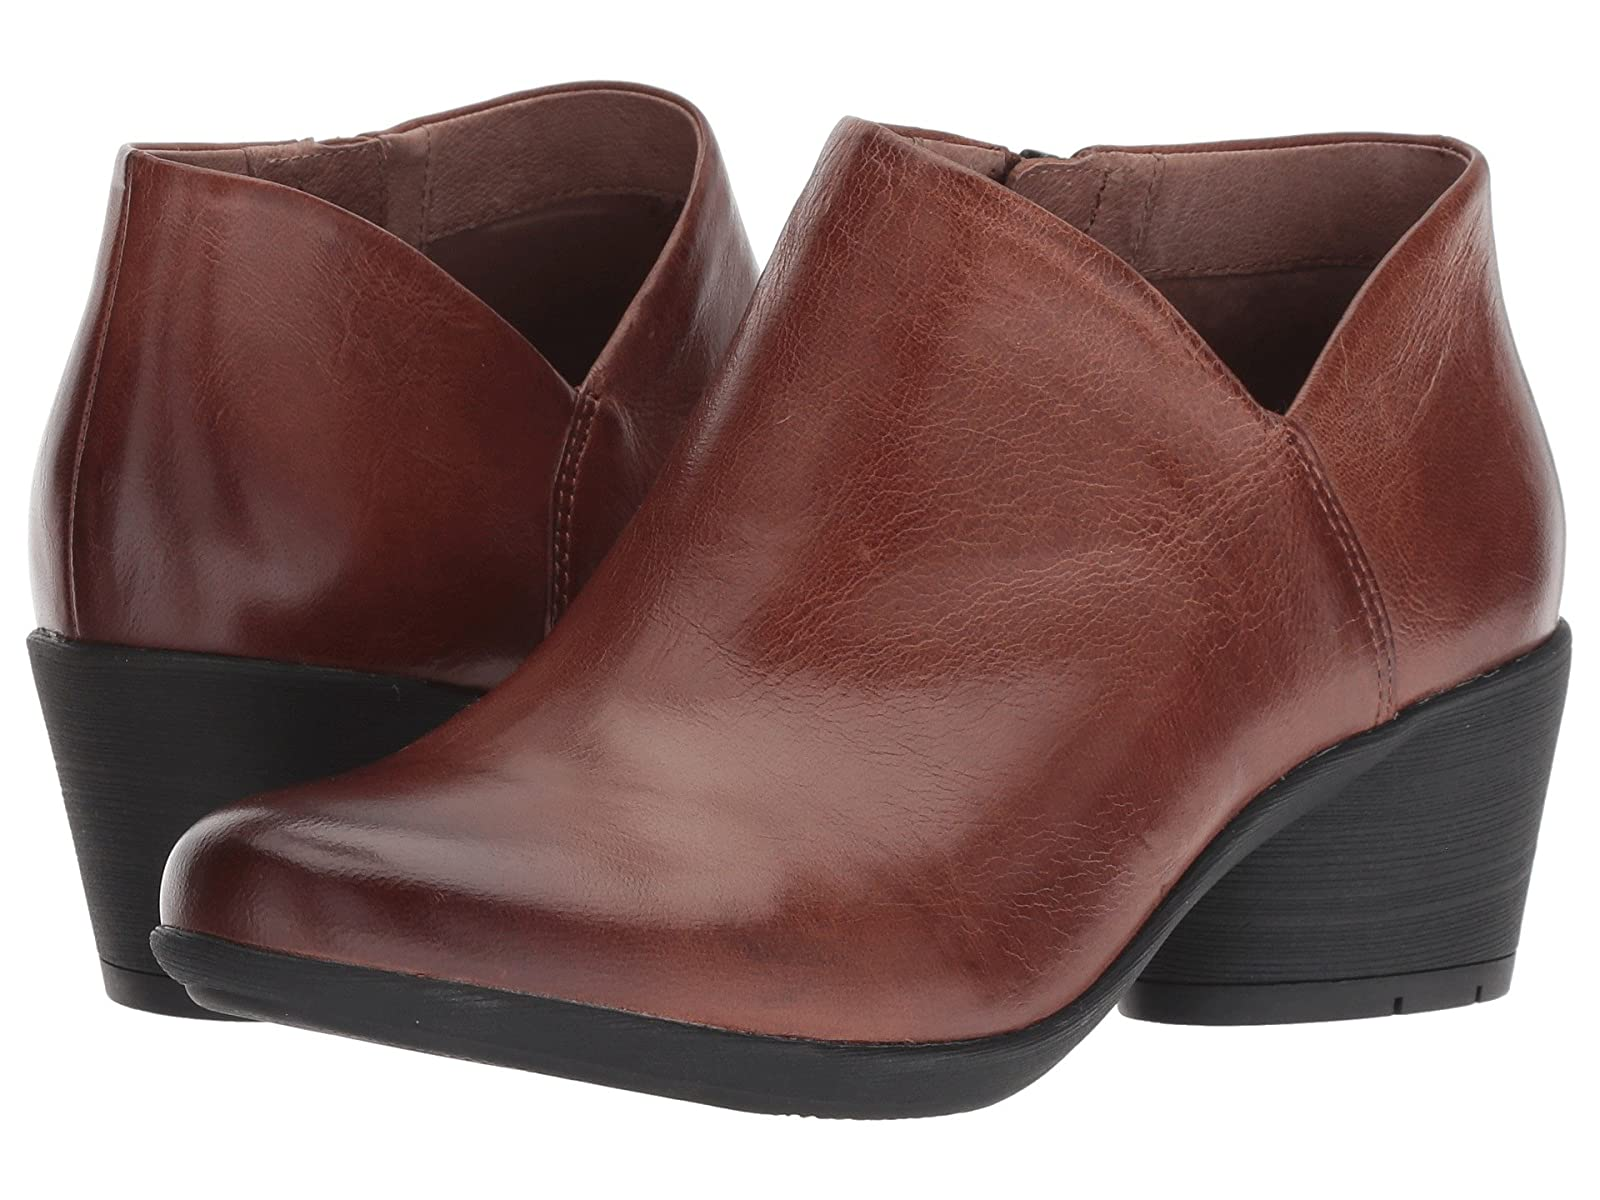 Dansko RainaAffordable and distinctive shoes